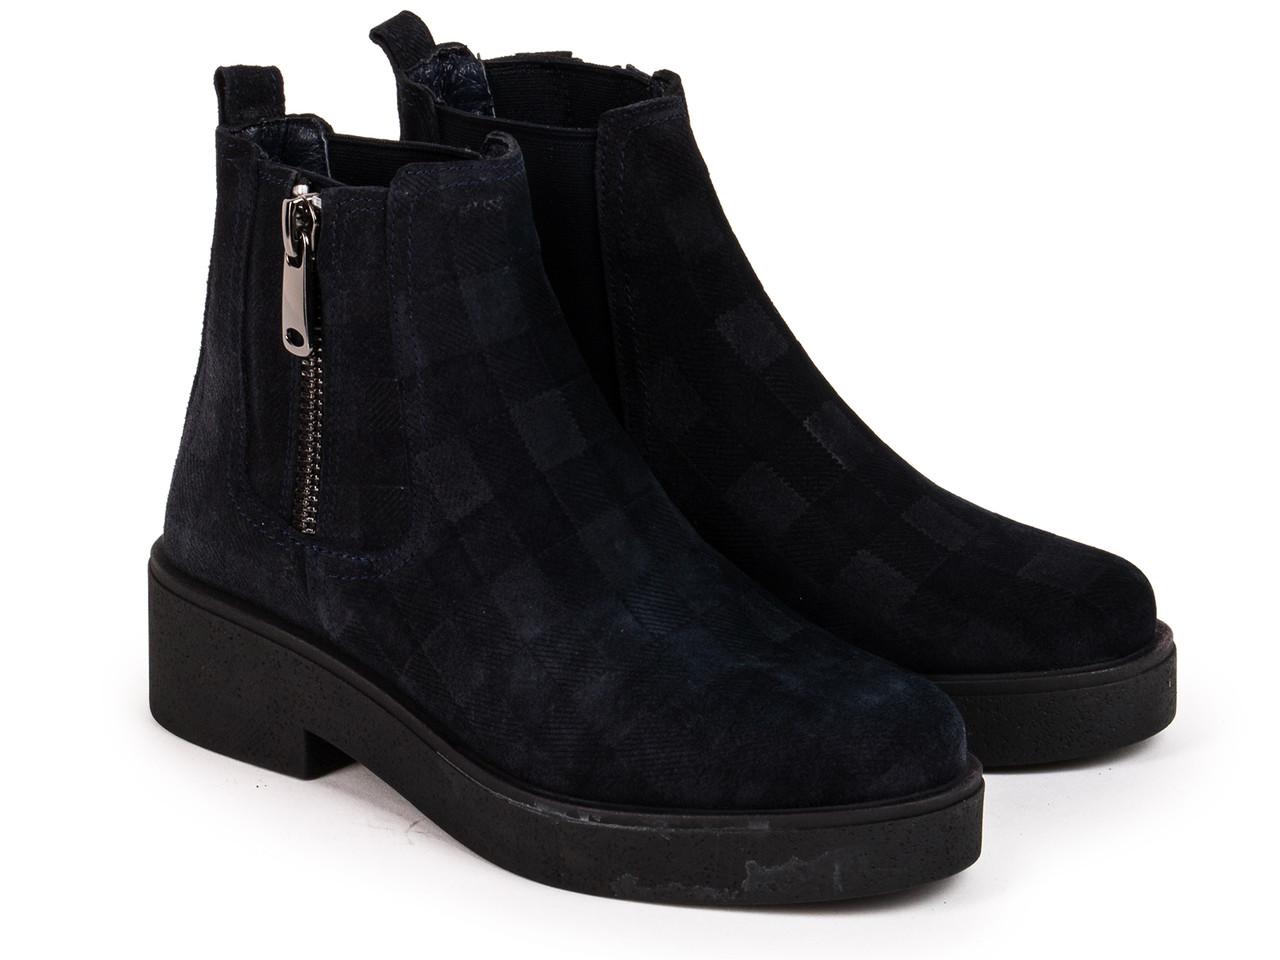 Ботинки Etor 5605-02140-1 синие